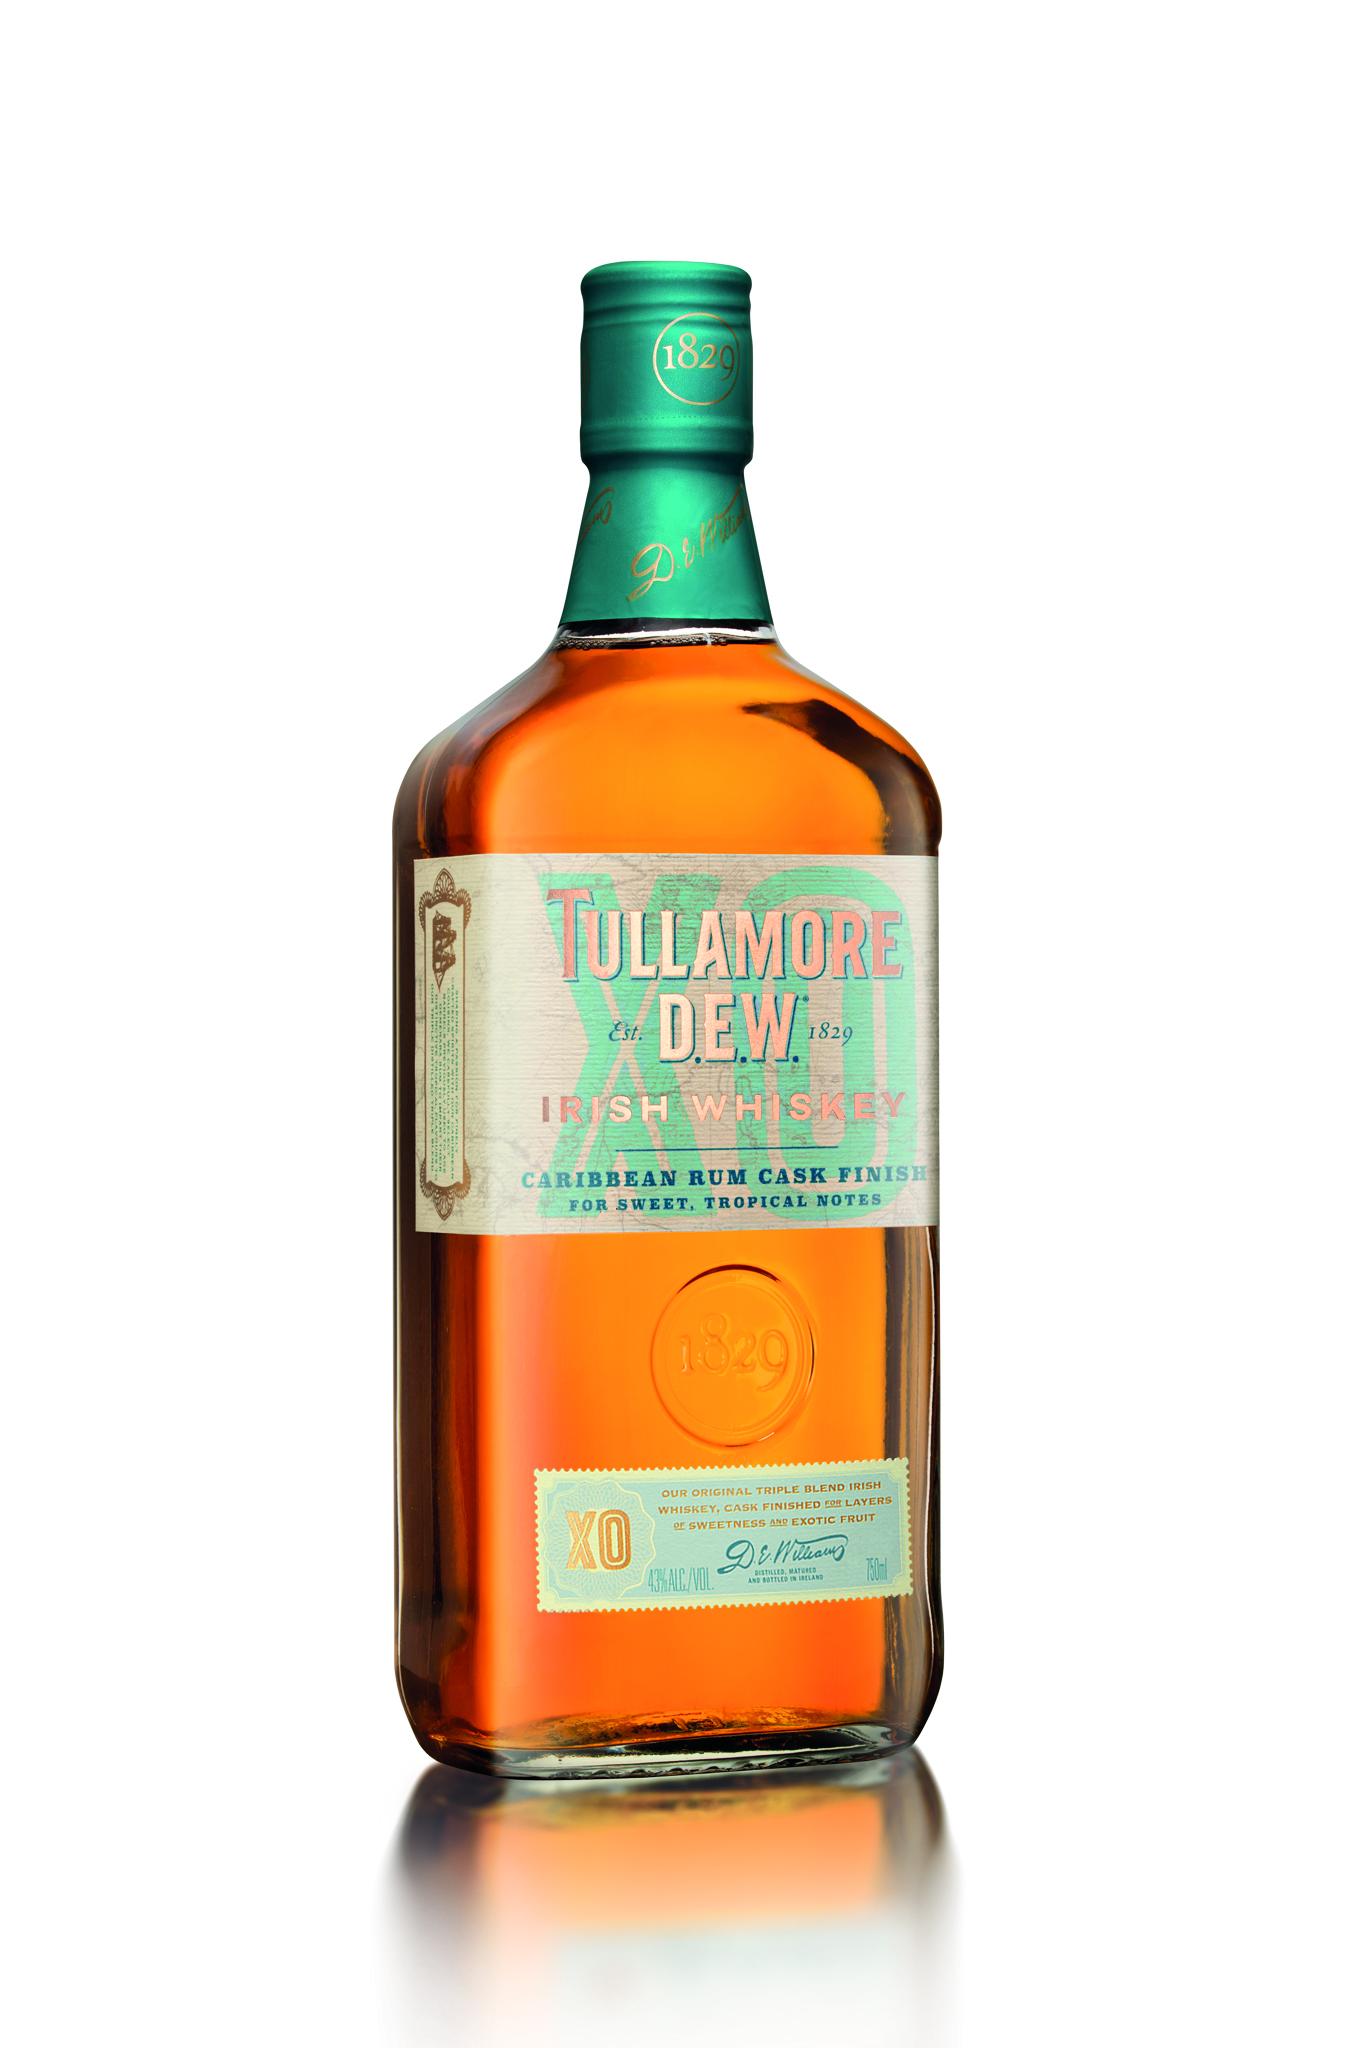 Tullamore D.E.W XO Caribbean Rum Cask Finish